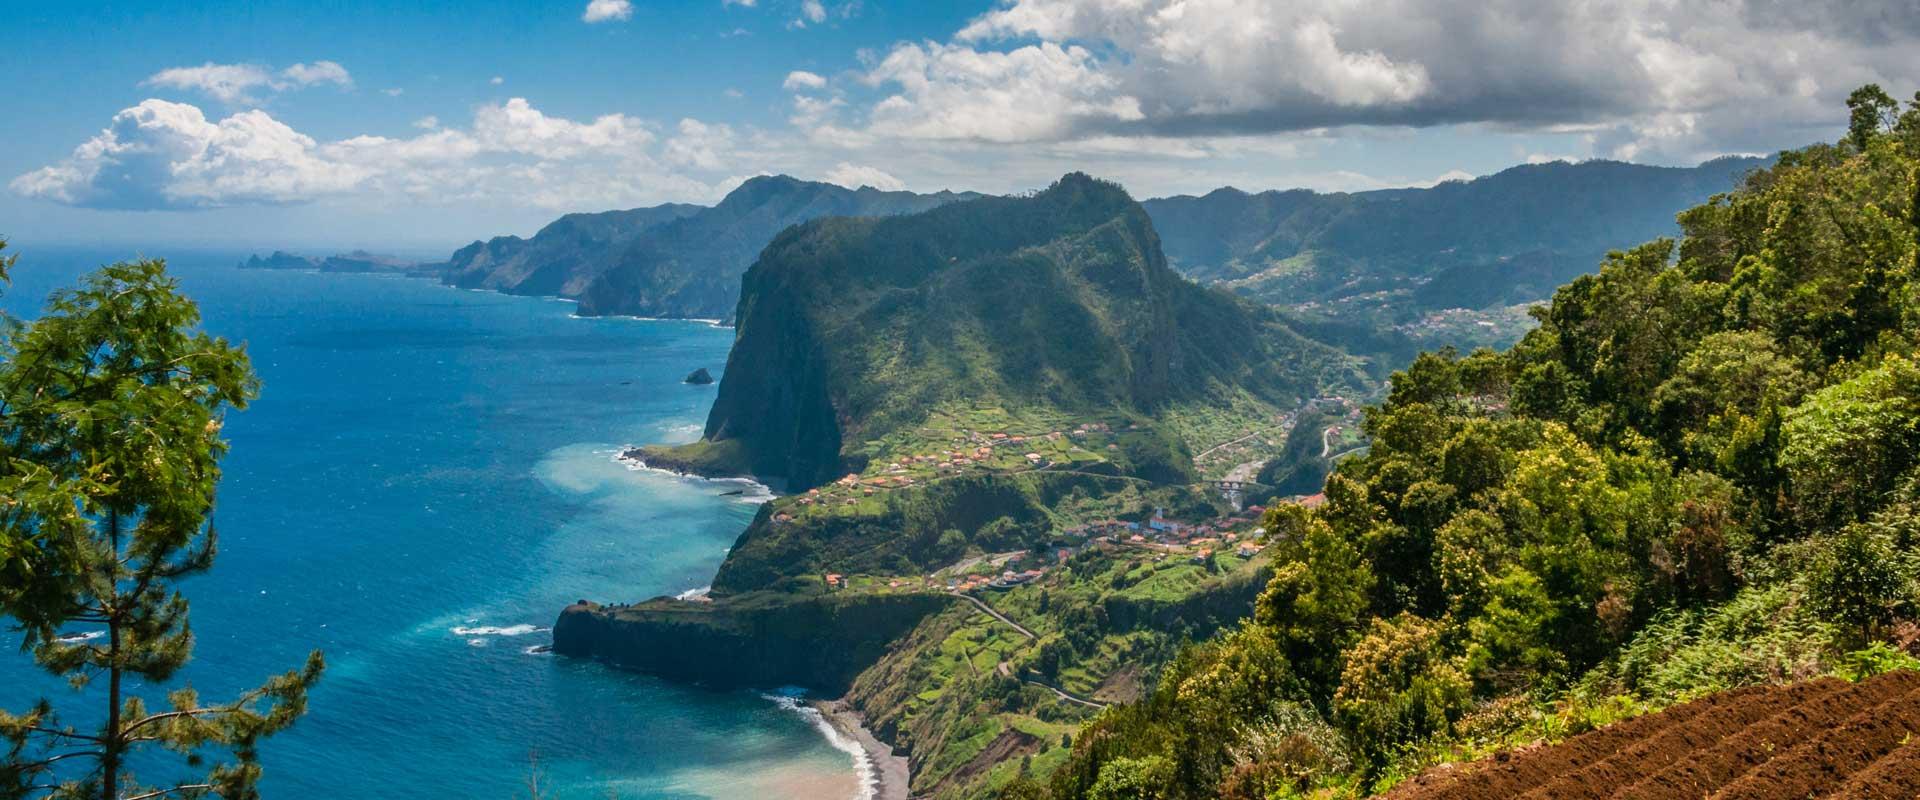 Trekking in Madeira